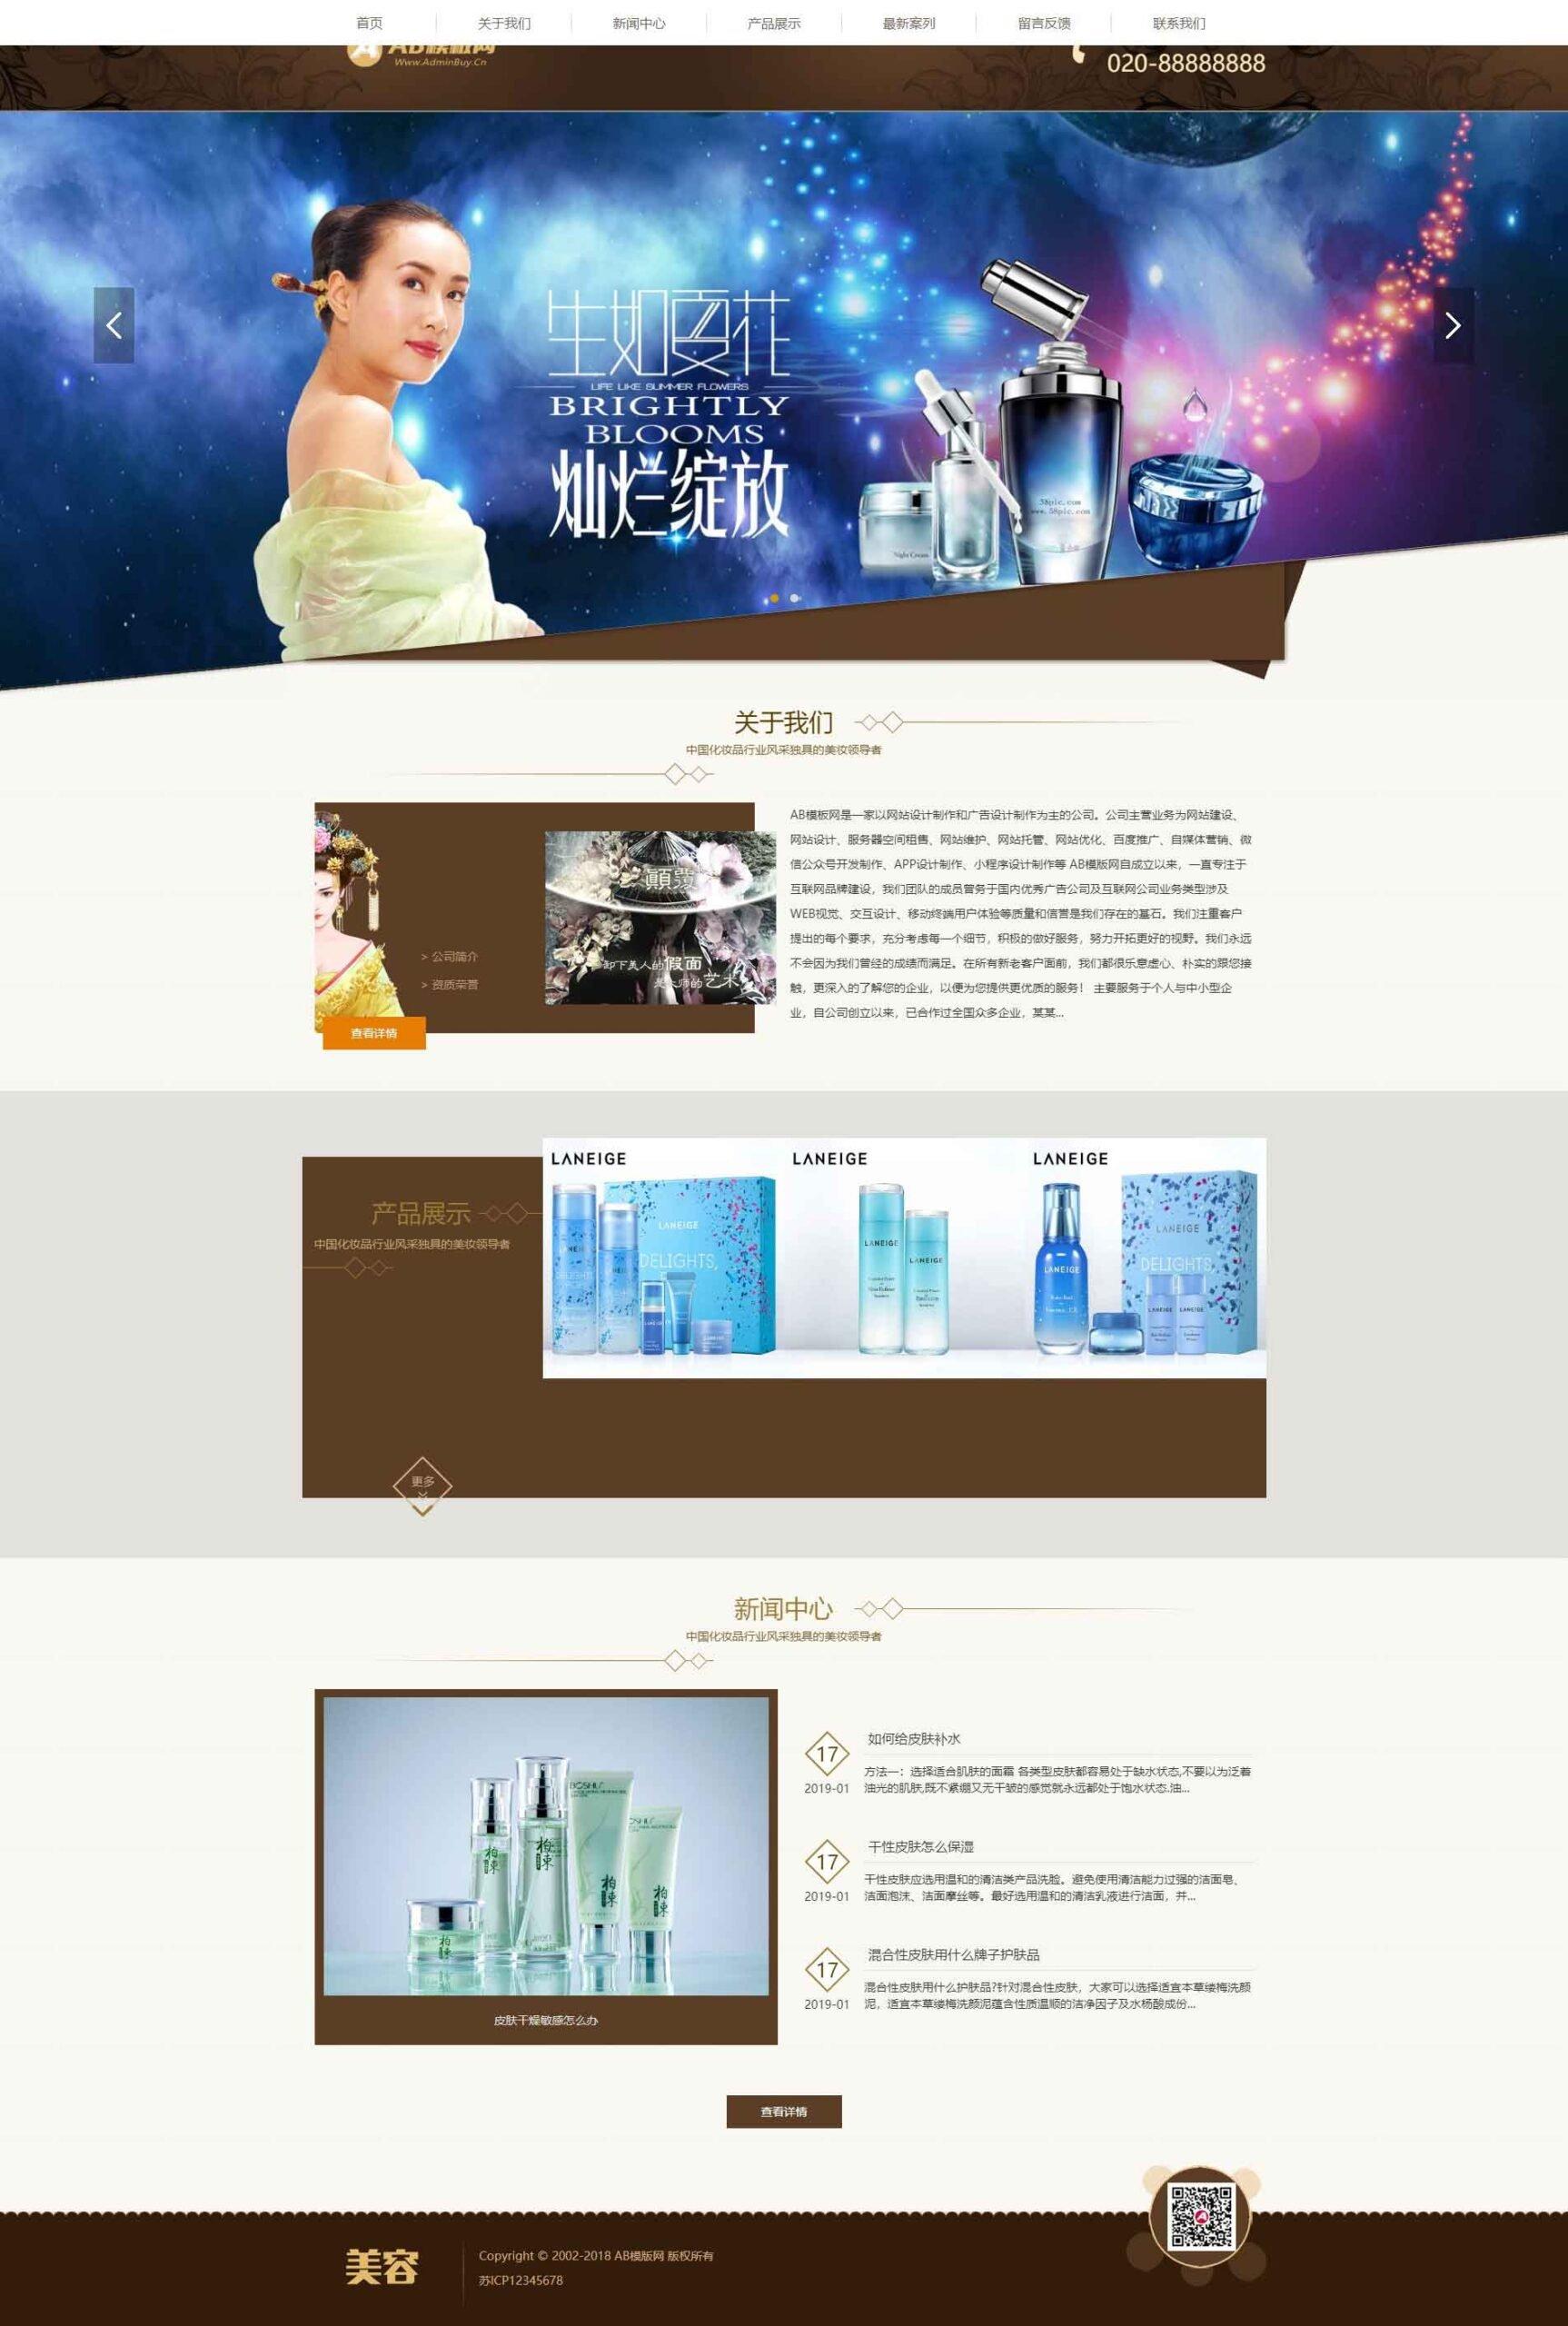 D48织梦化妆品模板dedecms自适应手机端企业网站模板源码